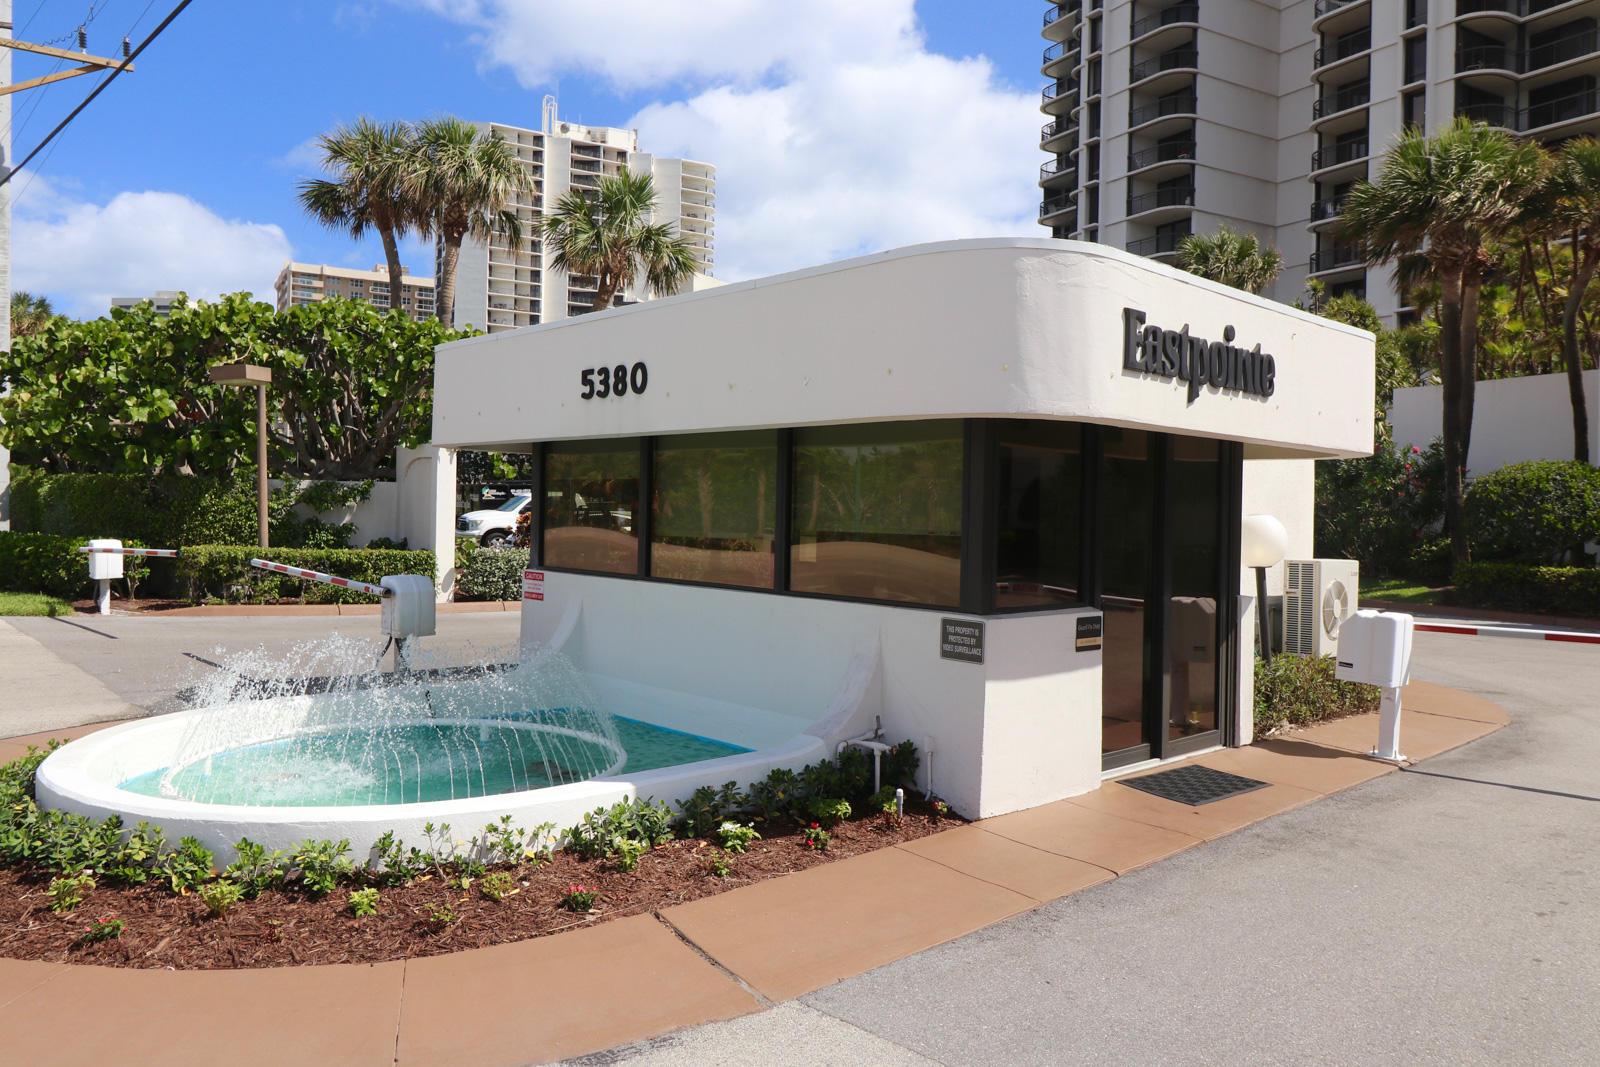 5380 Ocean Drive 4d, Singer Island, Florida 33404, 3 Bedrooms Bedrooms, ,3 BathroomsBathrooms,A,Condominium,Ocean,RX-10418531